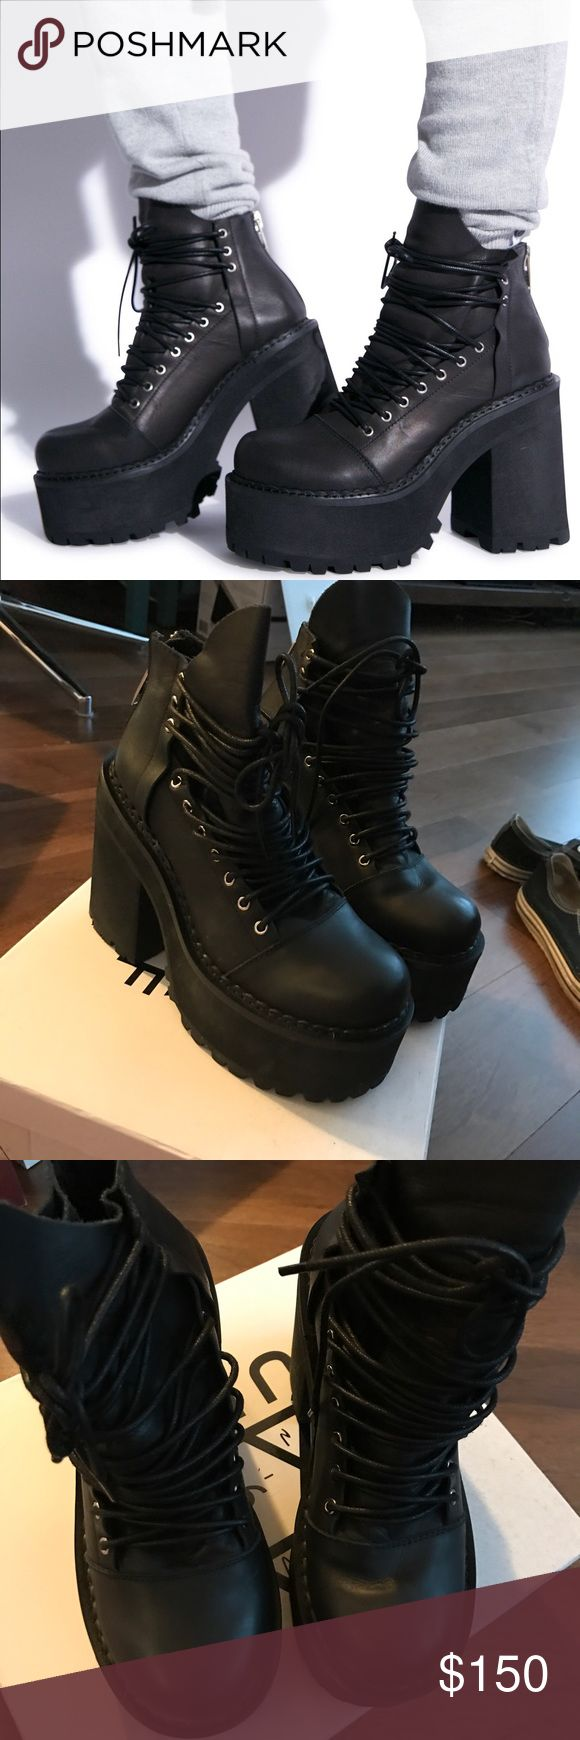 UNIF thrash boots Sz 7 Unif THRASH boots Sz 7 worn ONCE still for sale on unifs site for 188$ UNIF Shoes Platforms